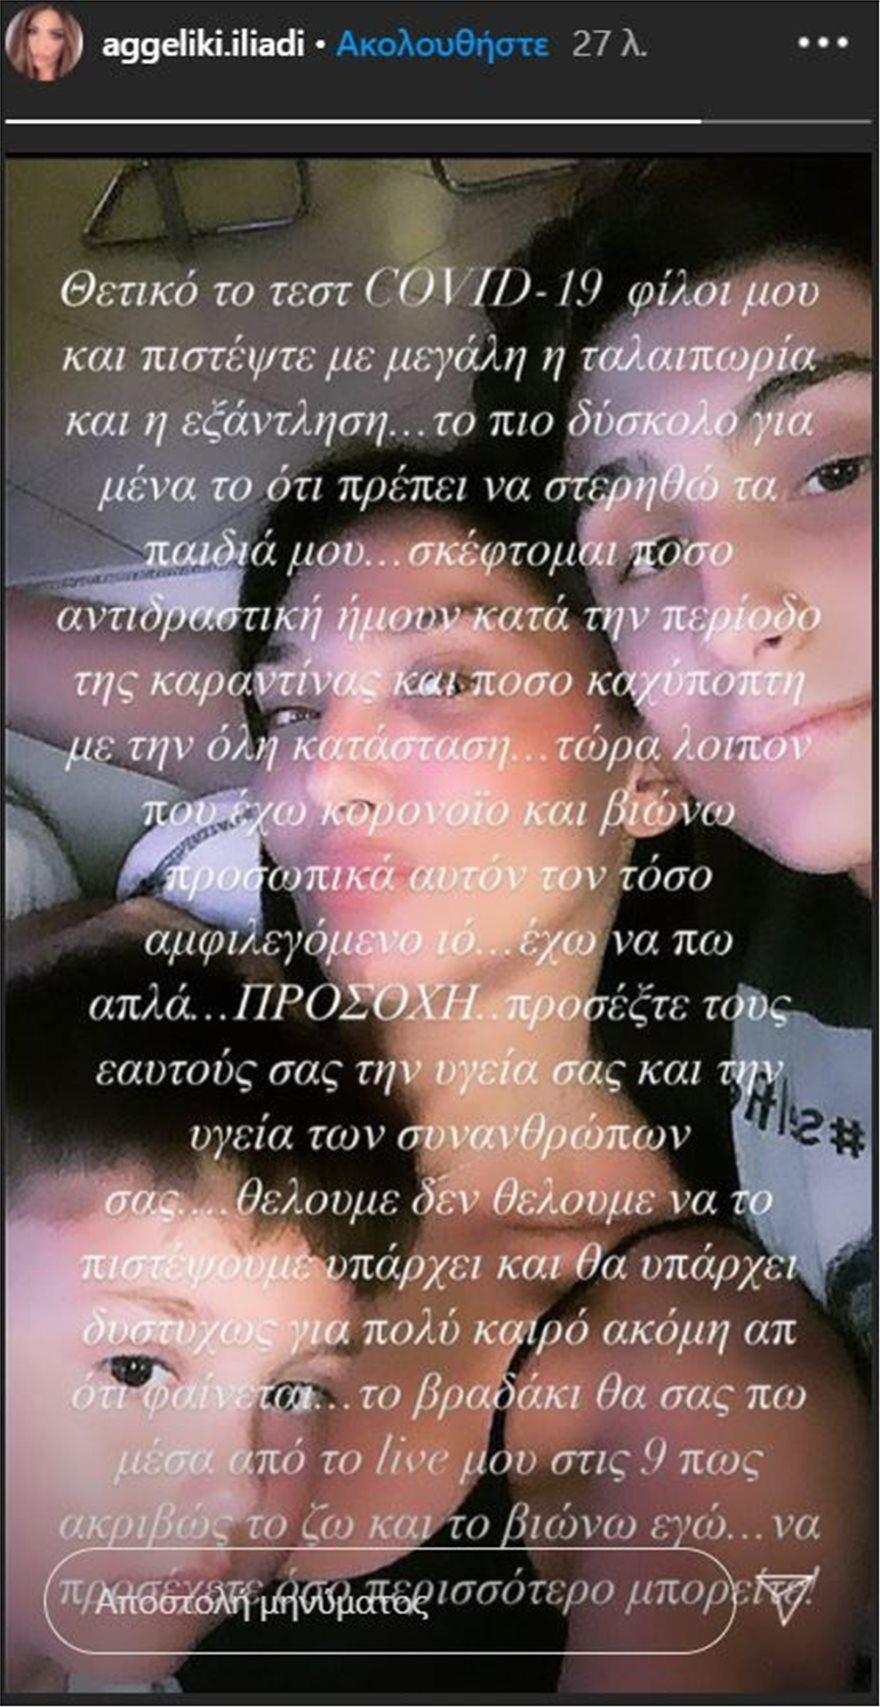 iliadi_aggeliki